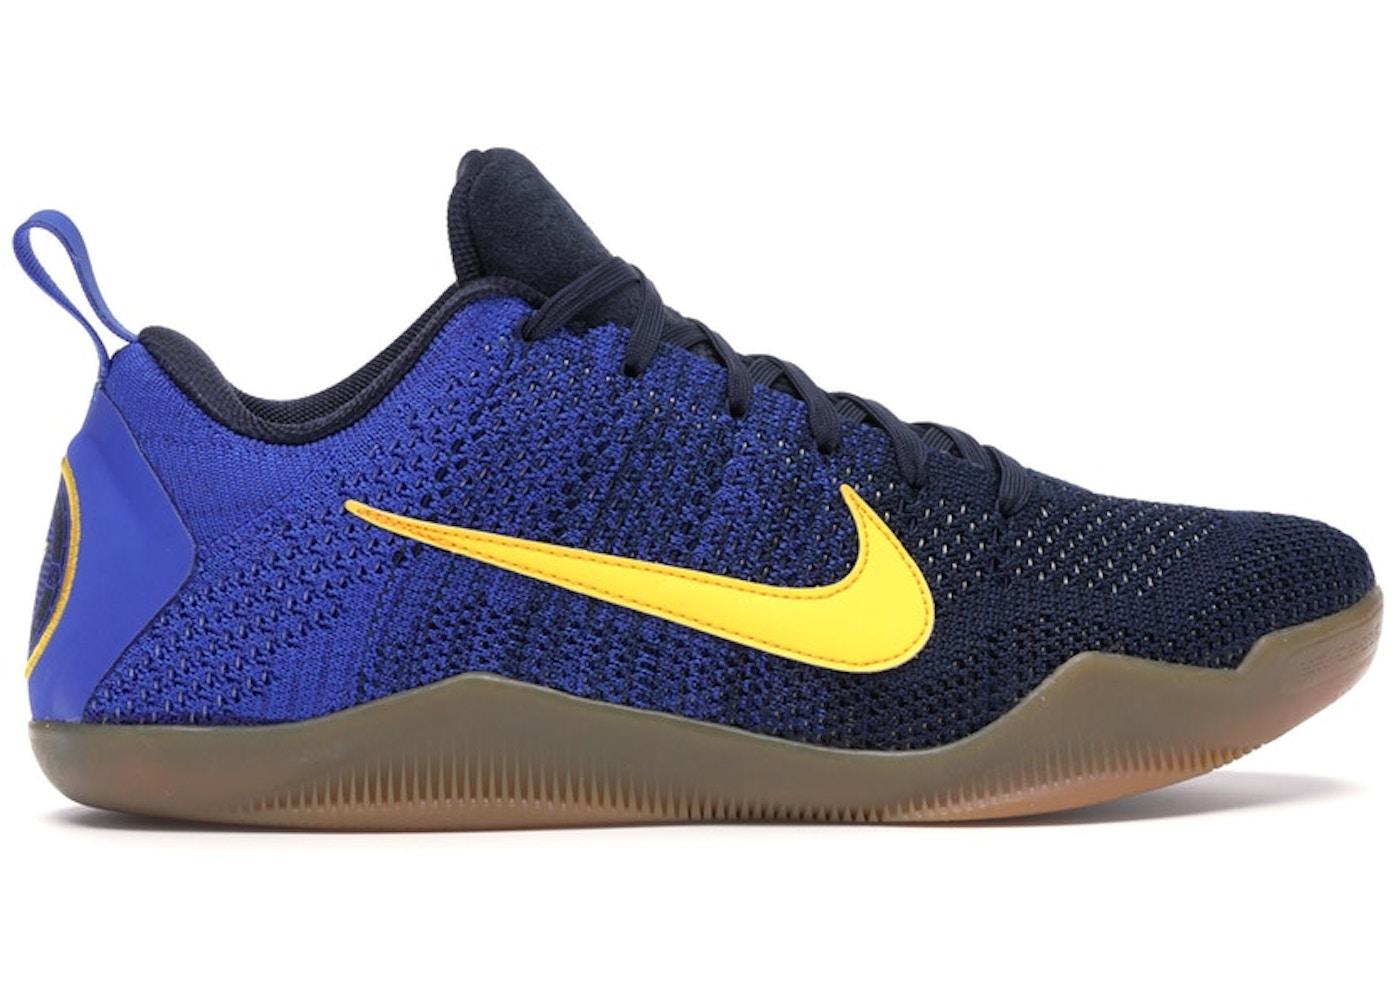 espiritual Yo disparar  Nike Kobe 11 Elite Low FCB Mambacurial - 844130-464